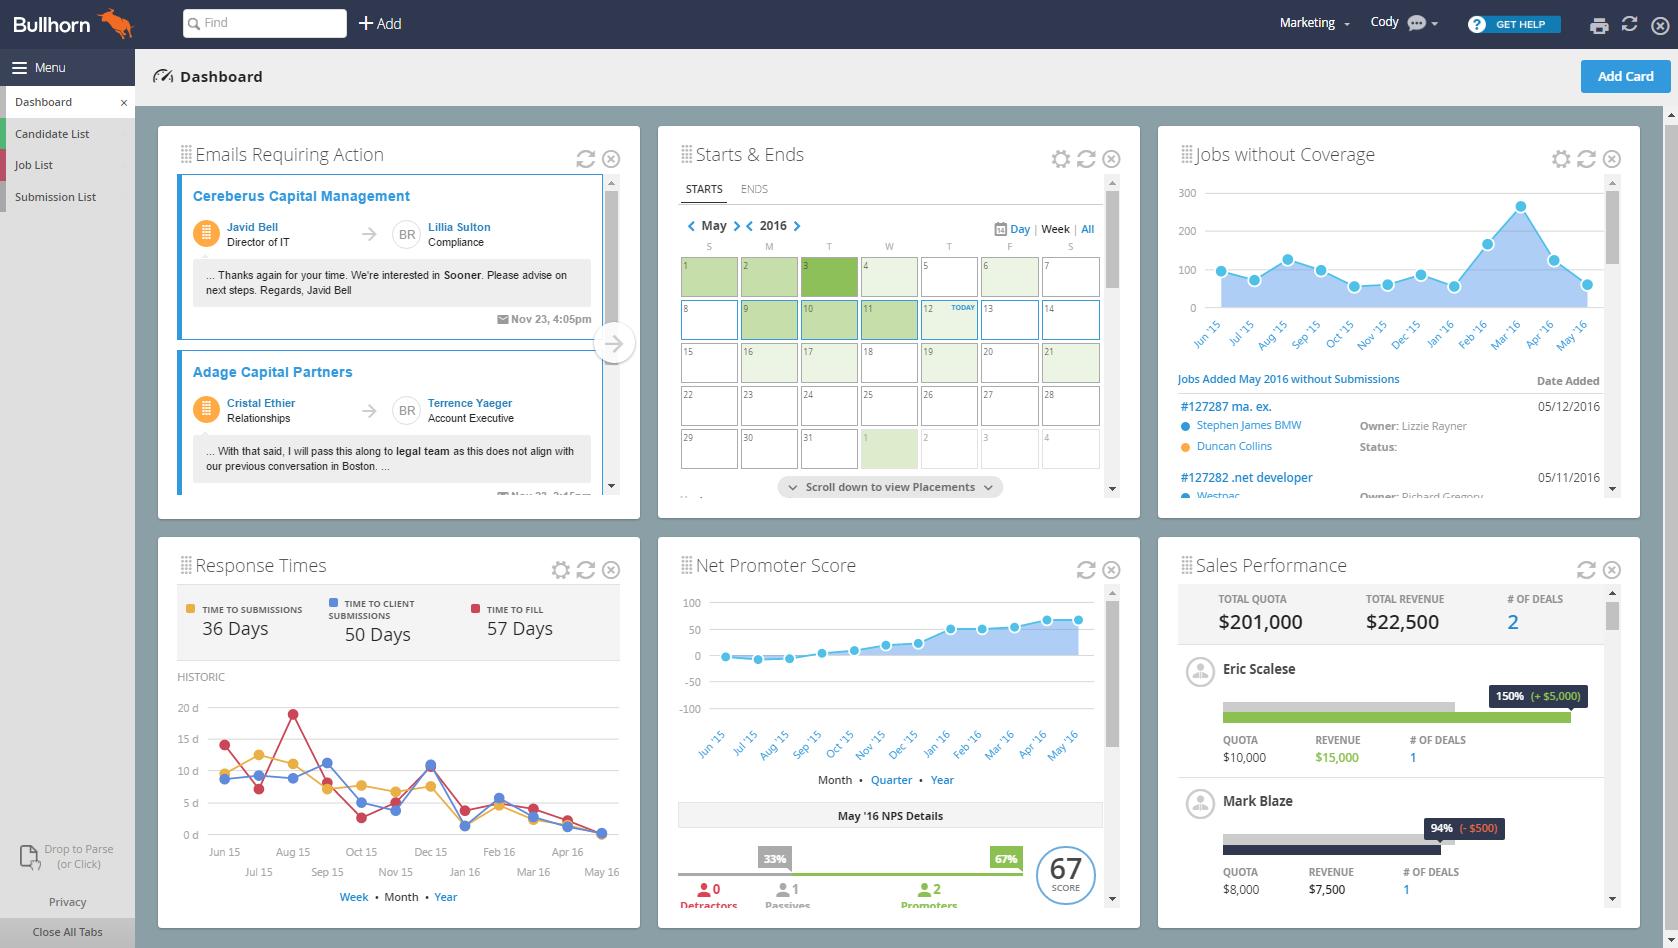 Bullhorn ATS & CRM Software - 4